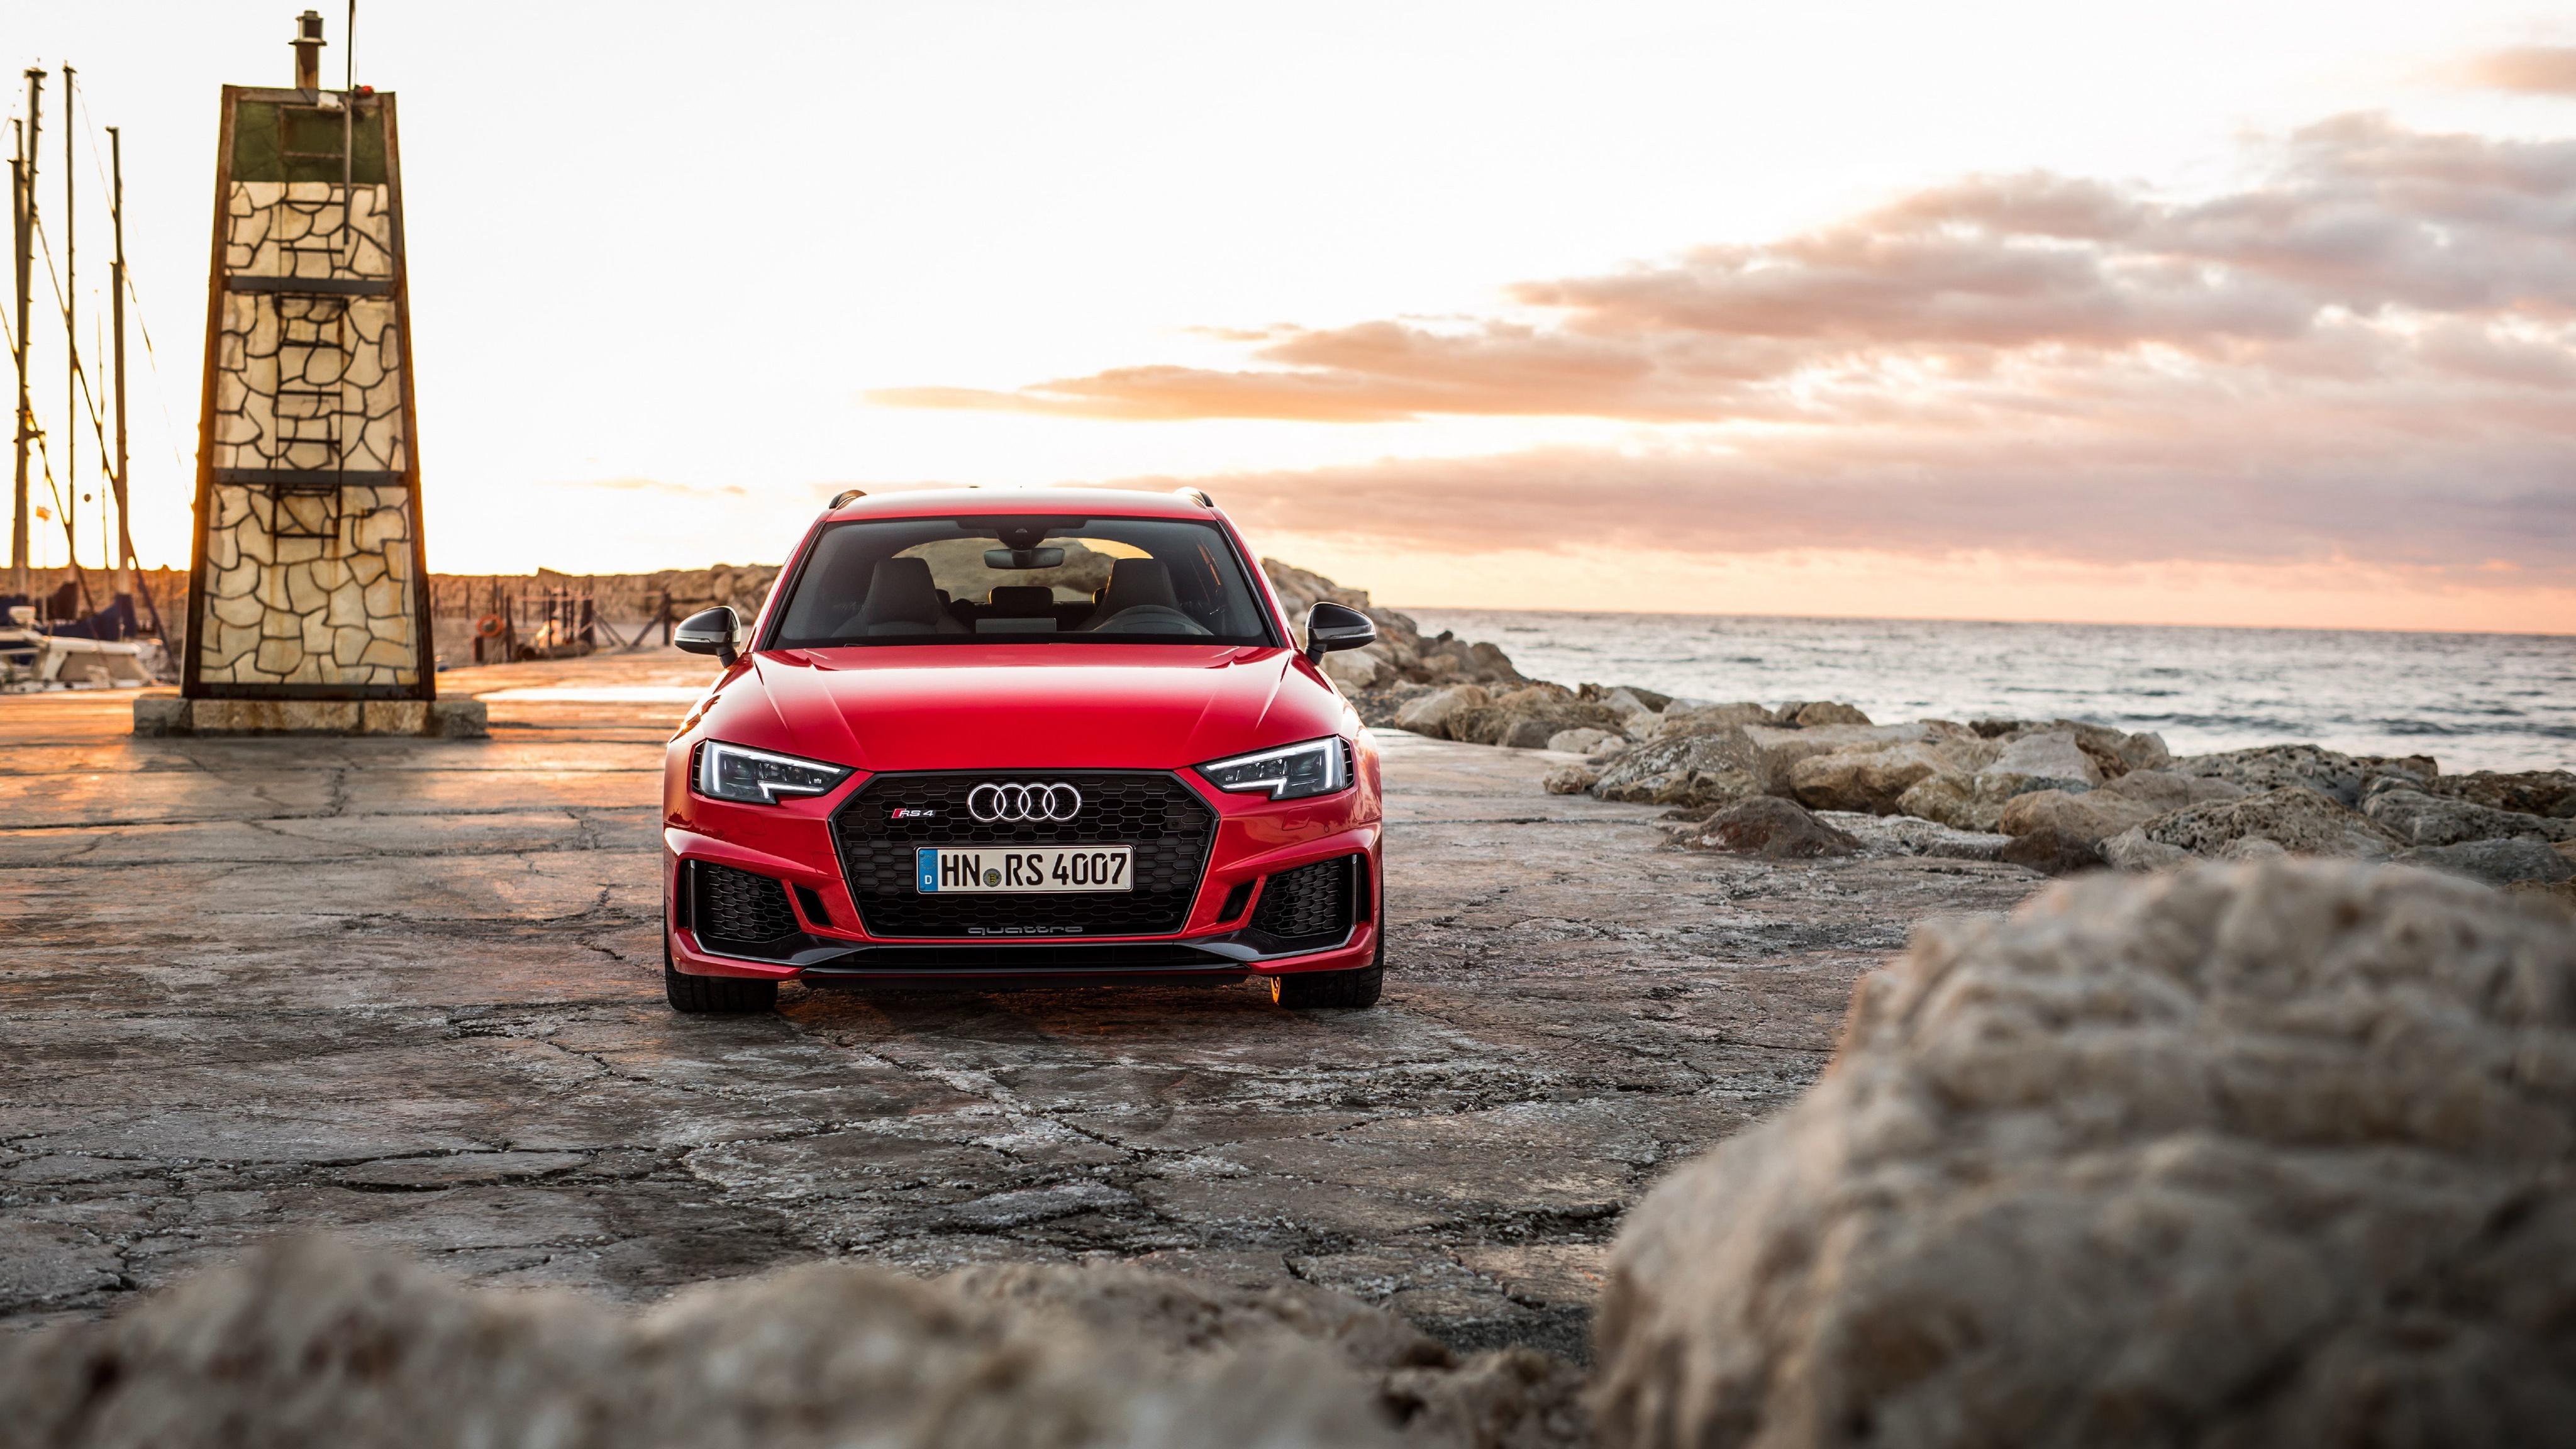 Audi Rs4 4k Ultra Hd Wallpaper Background Image 4096x2304 Id